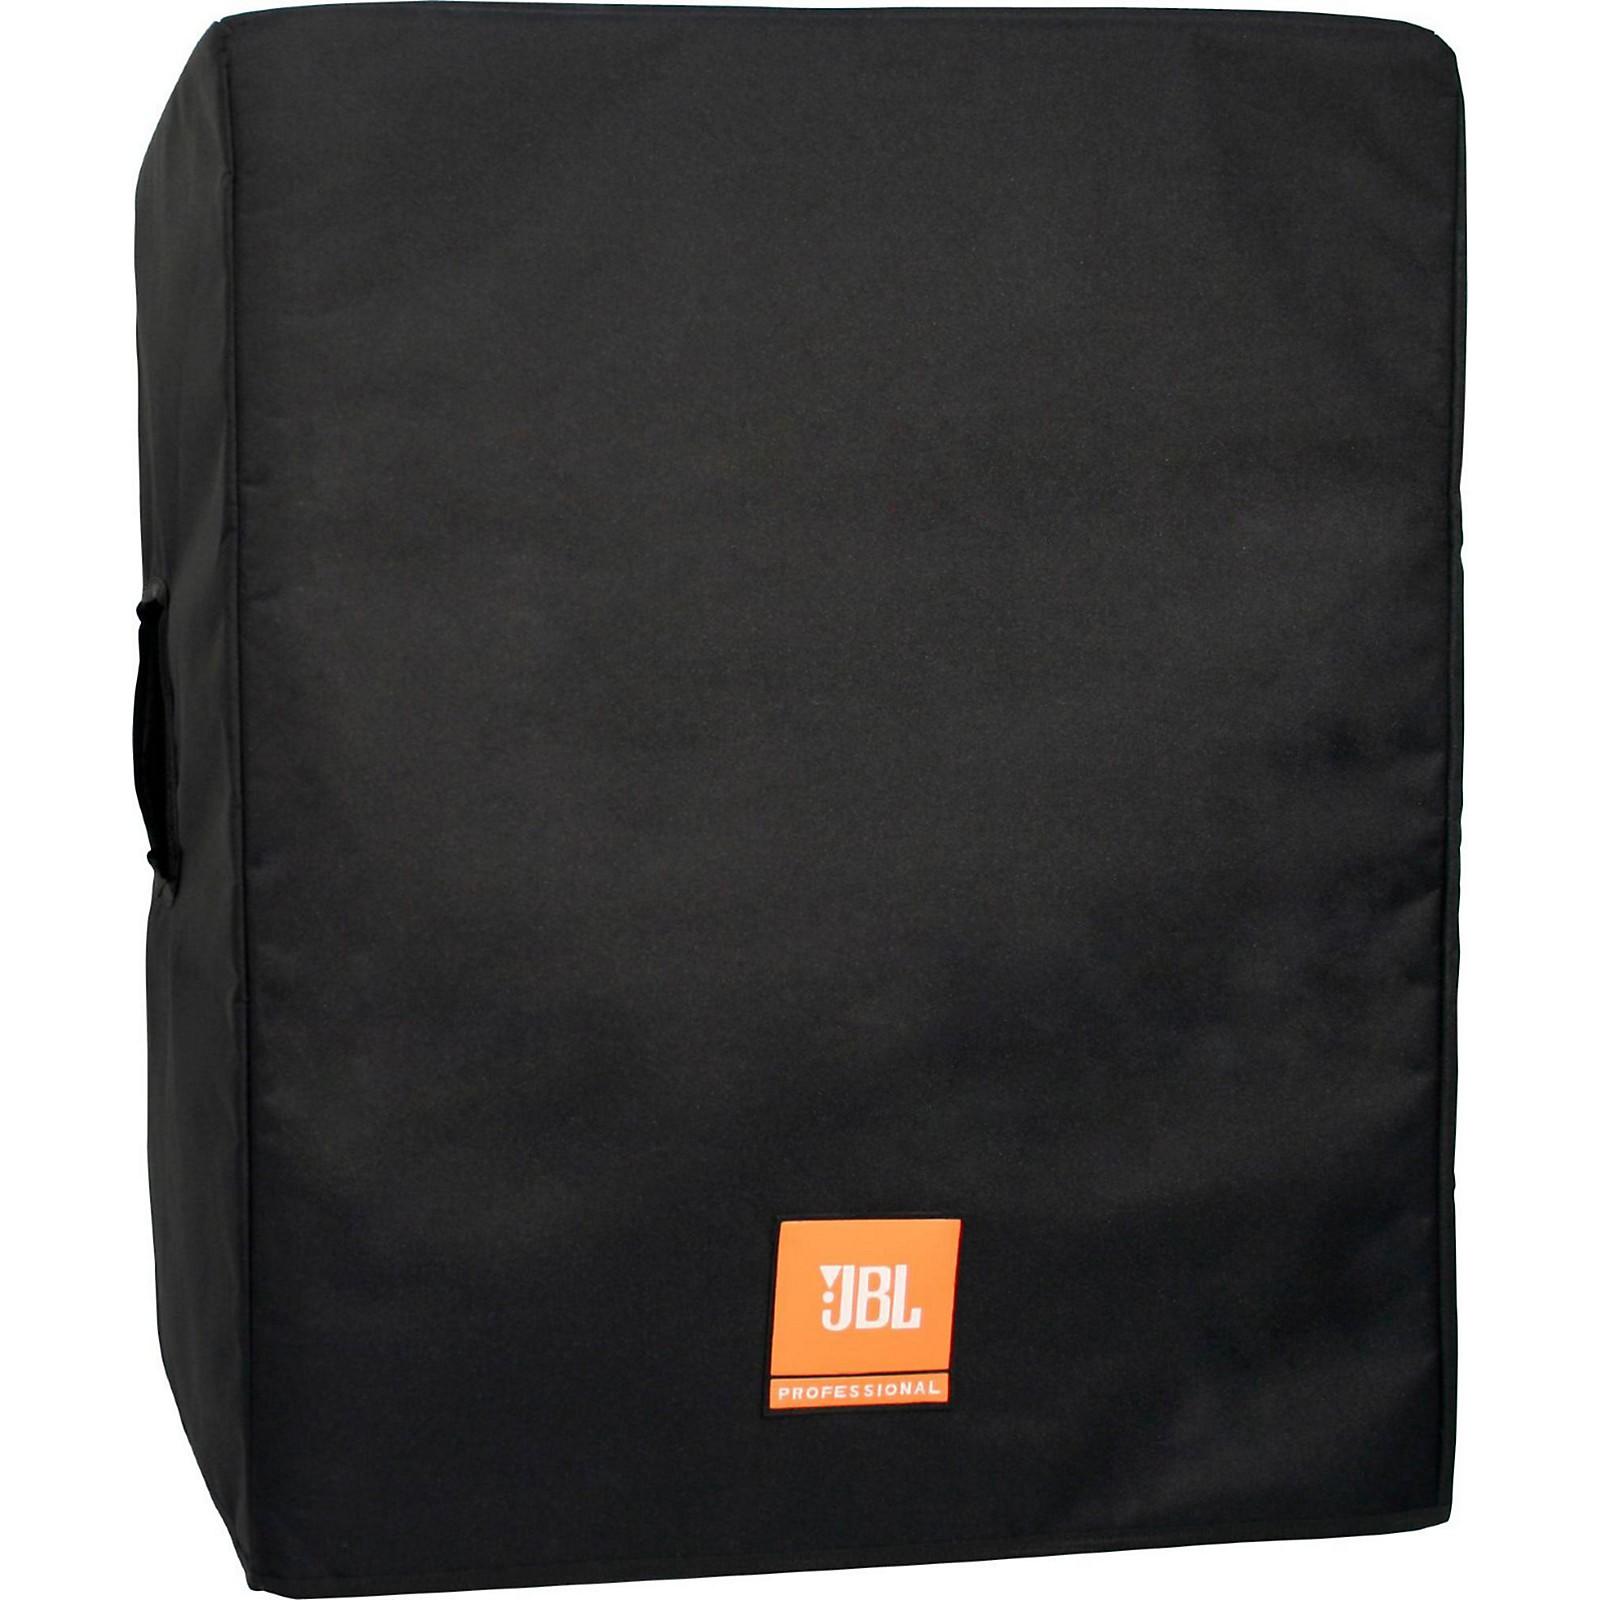 JBL Bag Deluxe Padded Cover for VRX918S